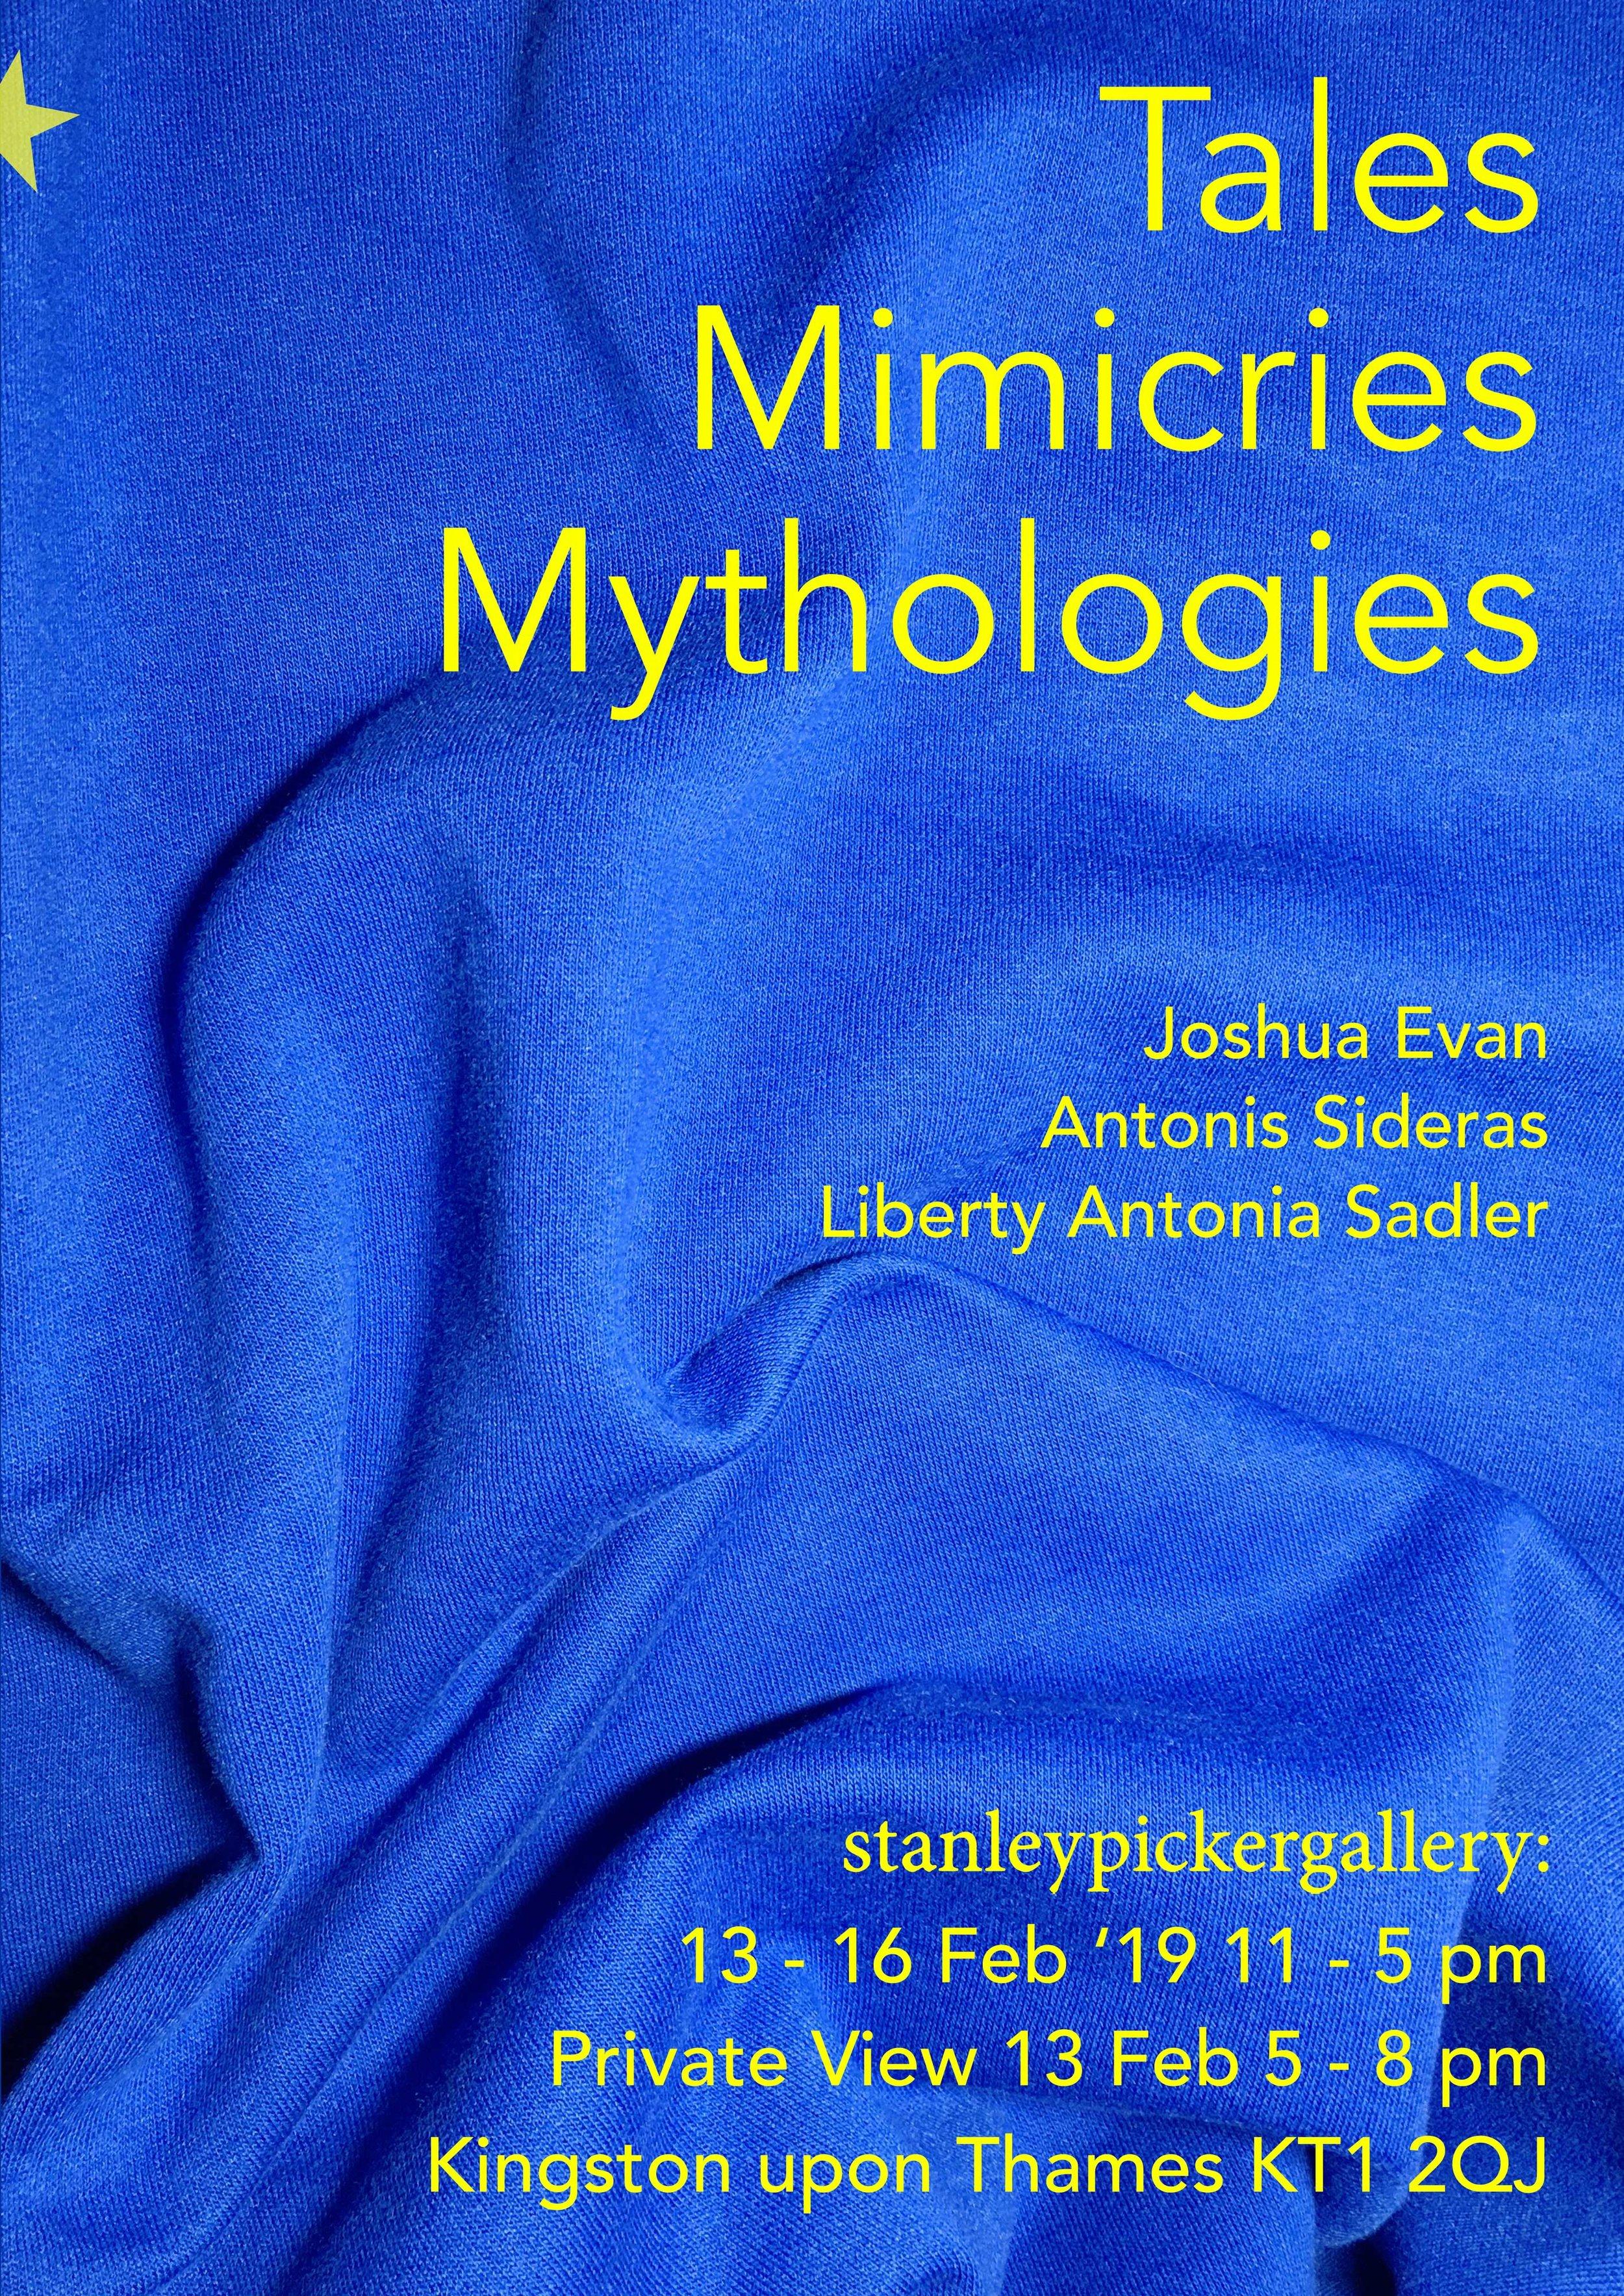 tales-mimicries-mythologies-v3.jpg